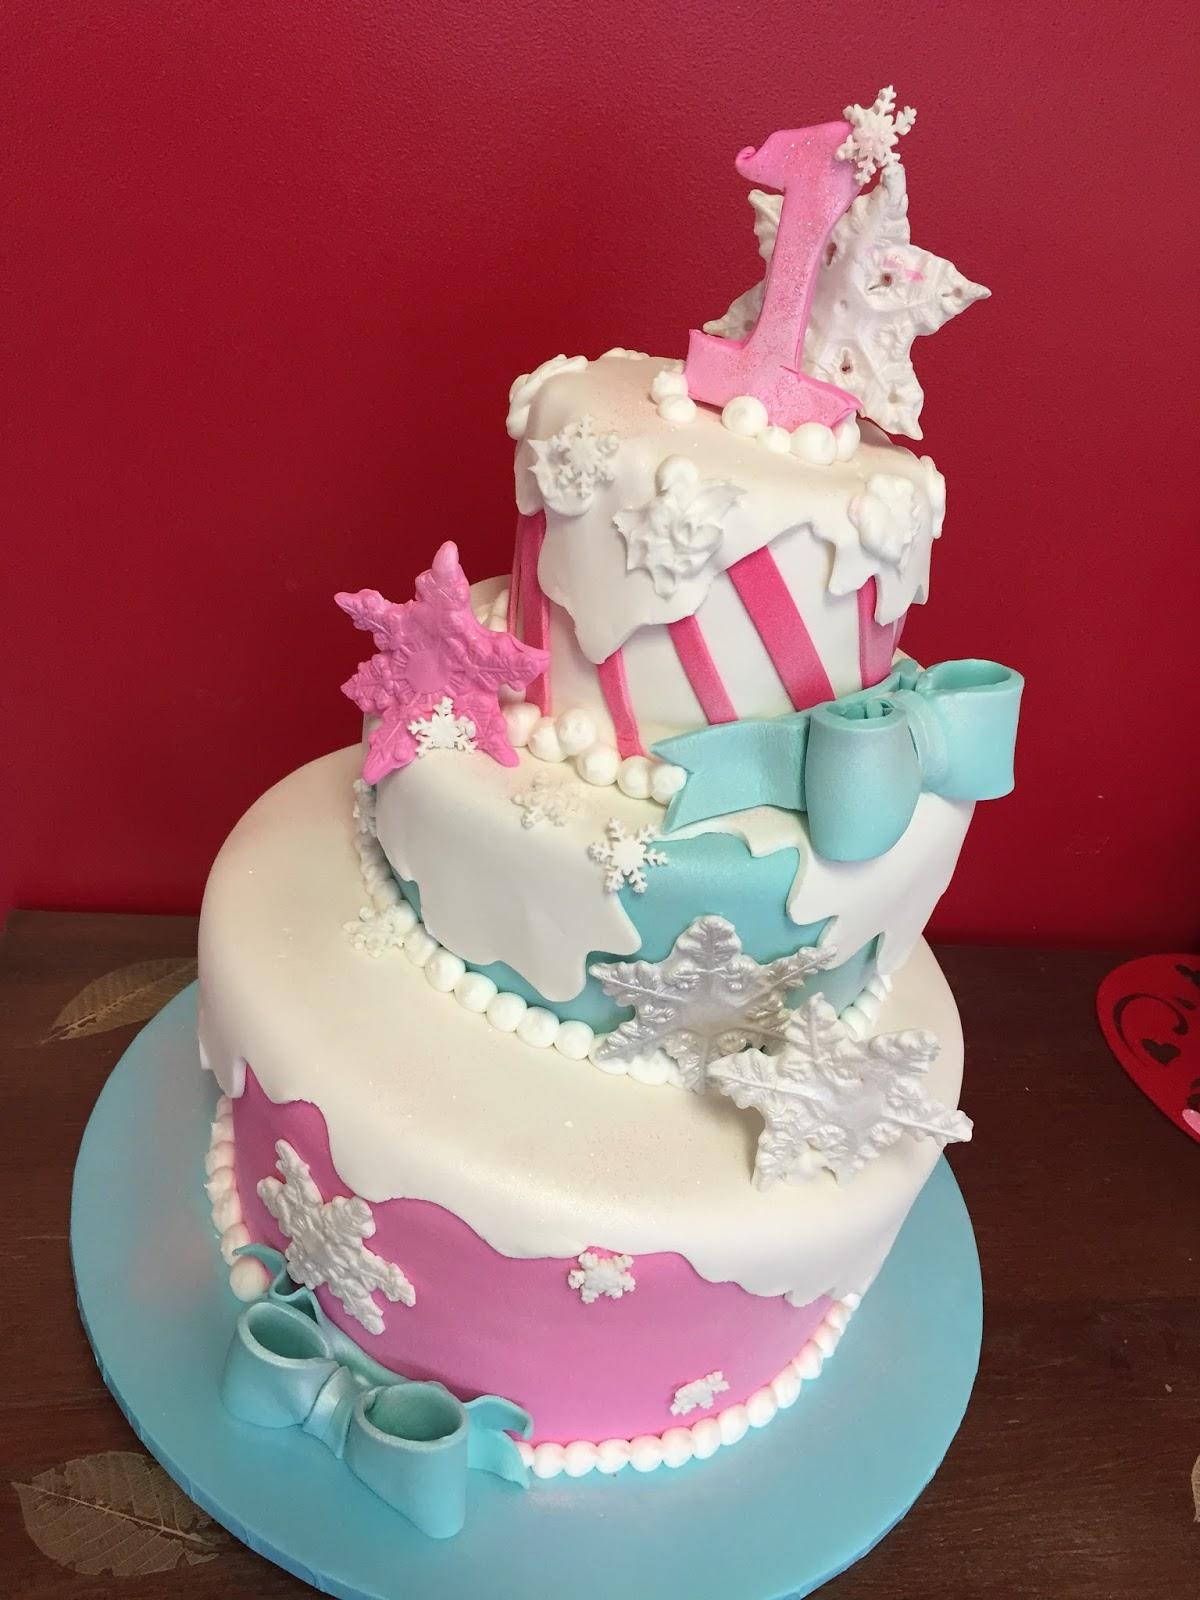 Baking With Roxanas Cakes 1st Birthday Cake Winter Wonderland Themed